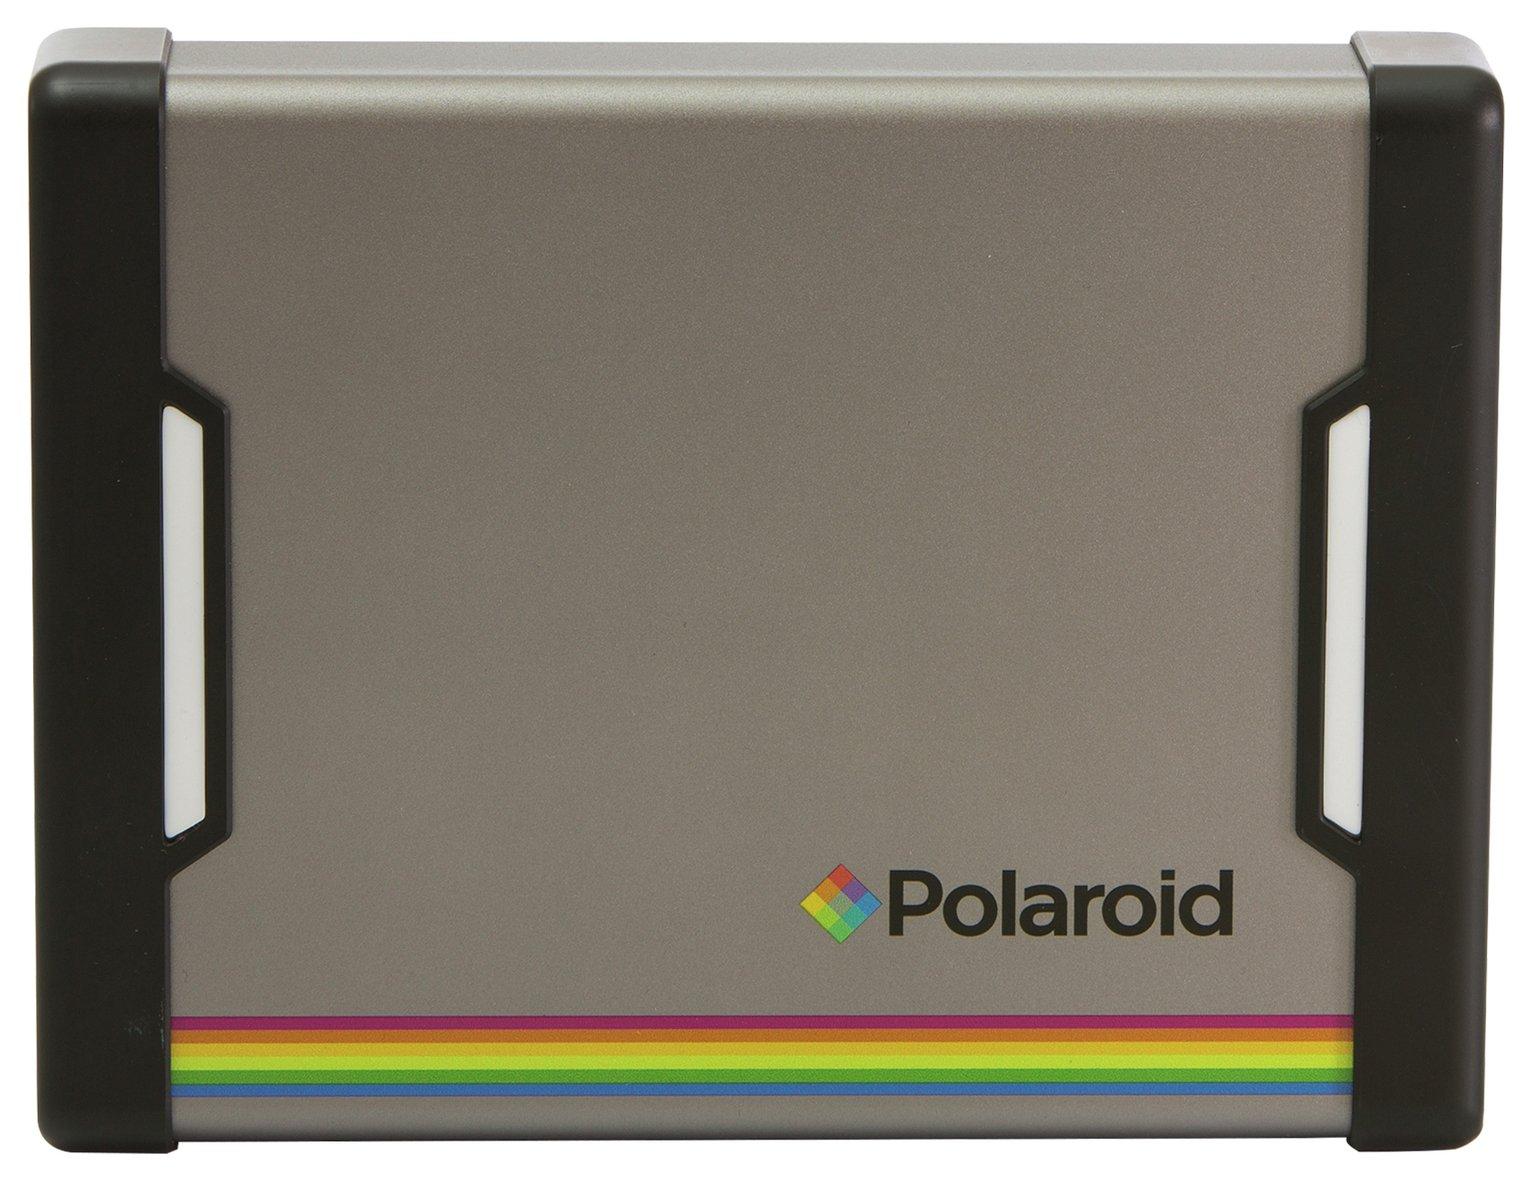 Polaroid PS300 289.5W Portable Power Supply